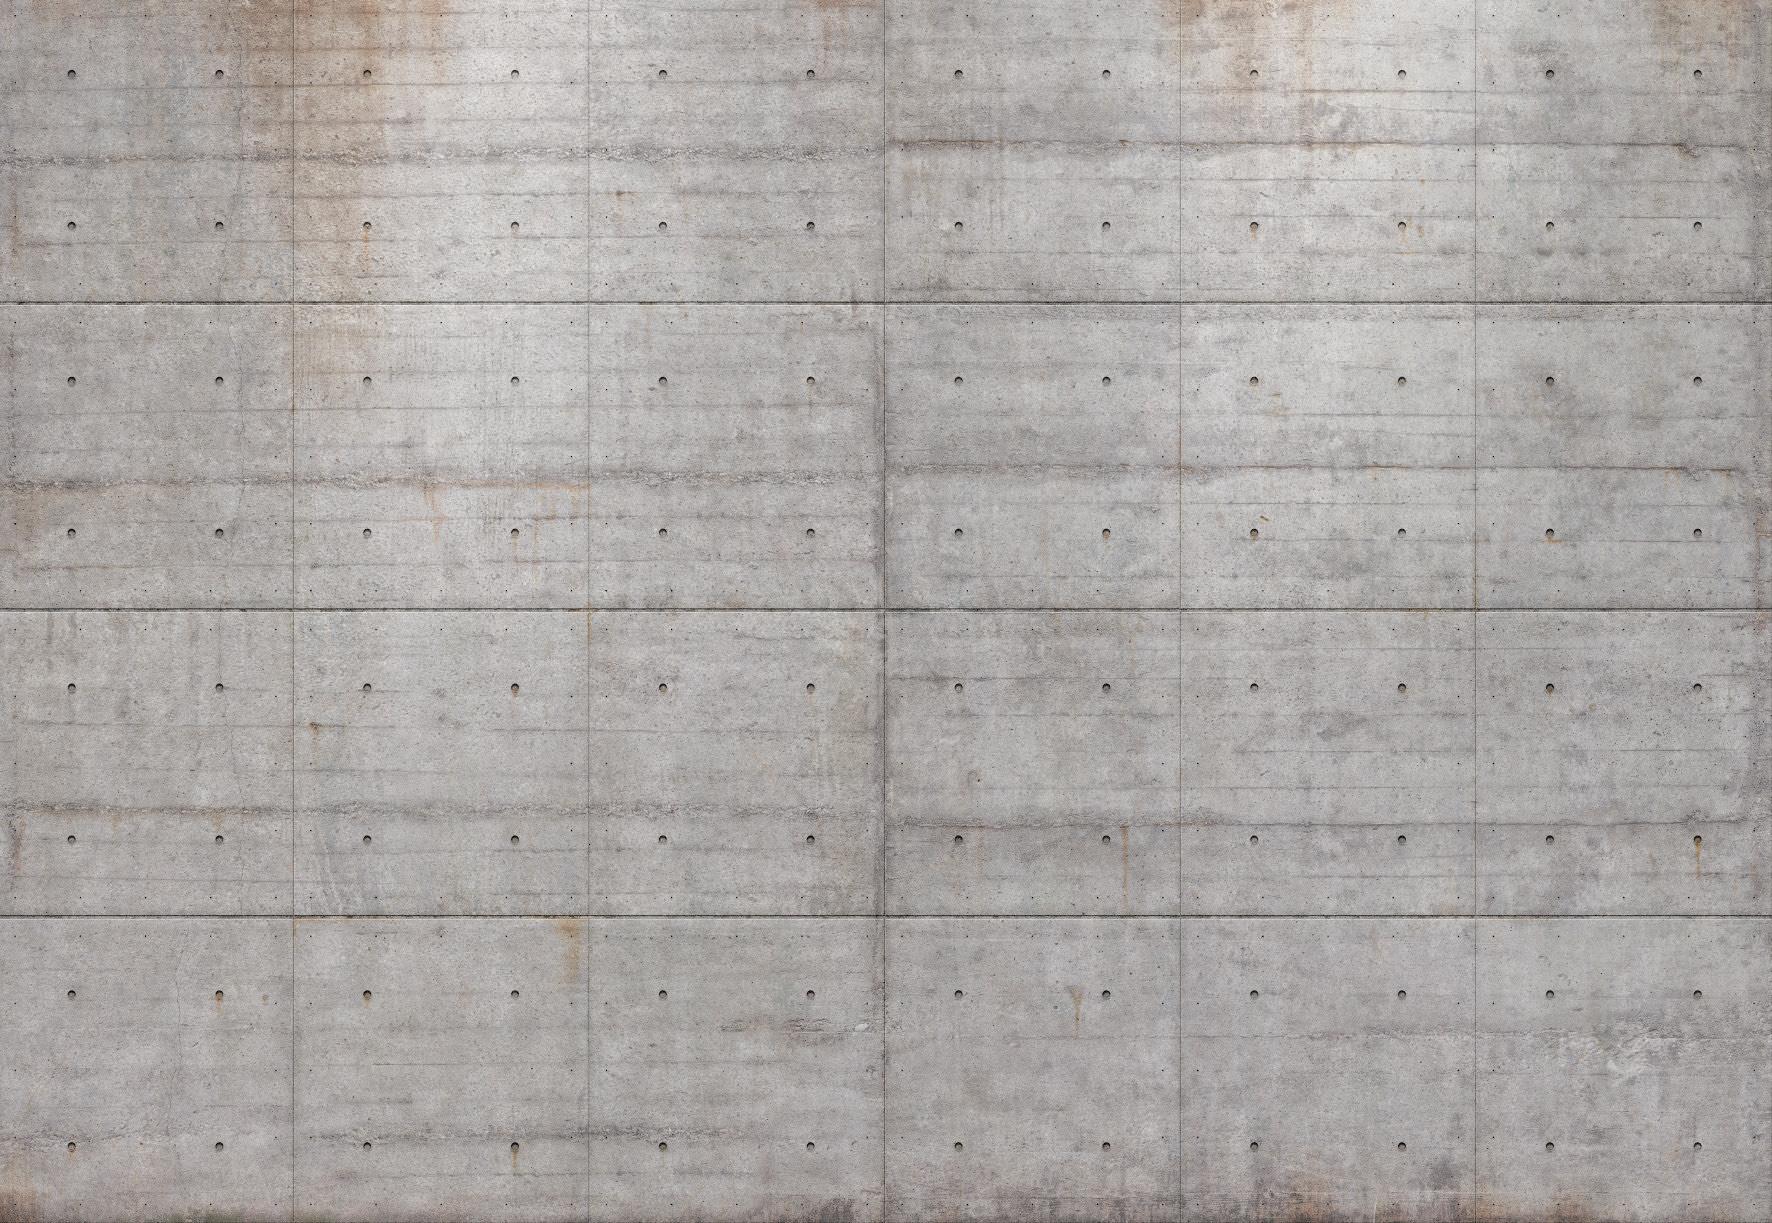 fototapete concrete 368x254 stone wall beton stonewall. Black Bedroom Furniture Sets. Home Design Ideas